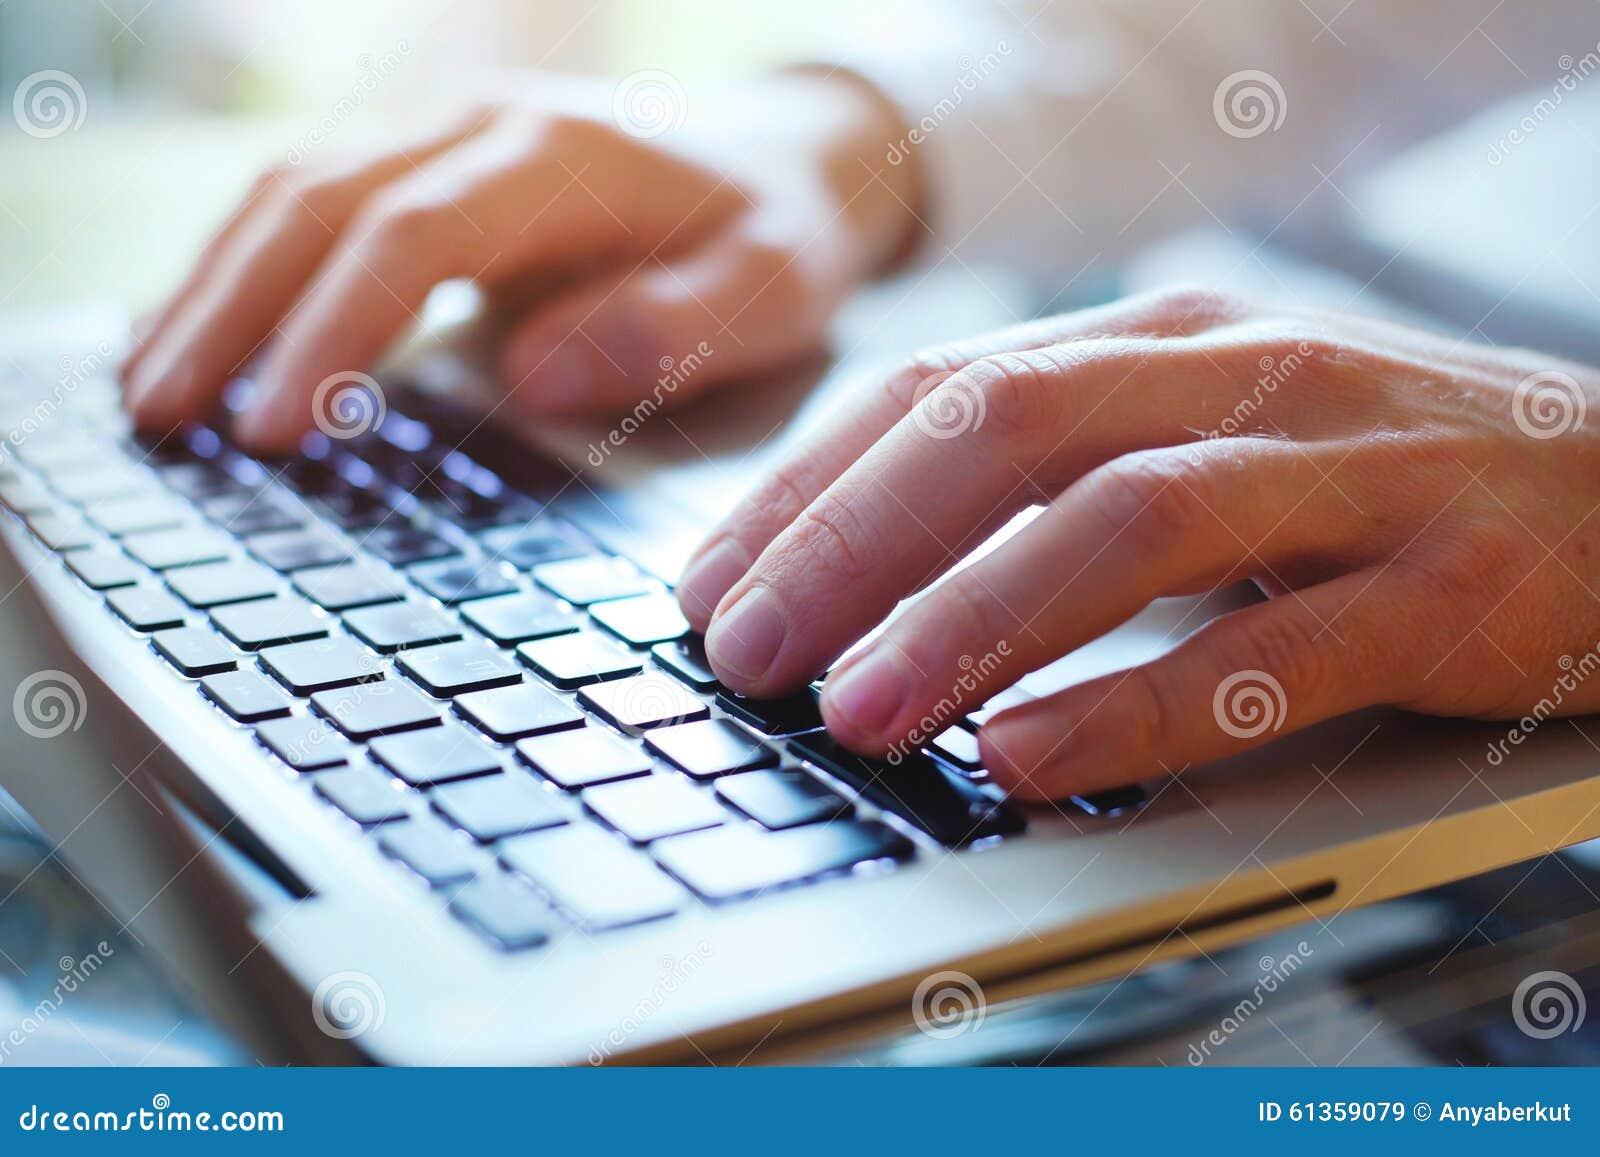 Work online concept